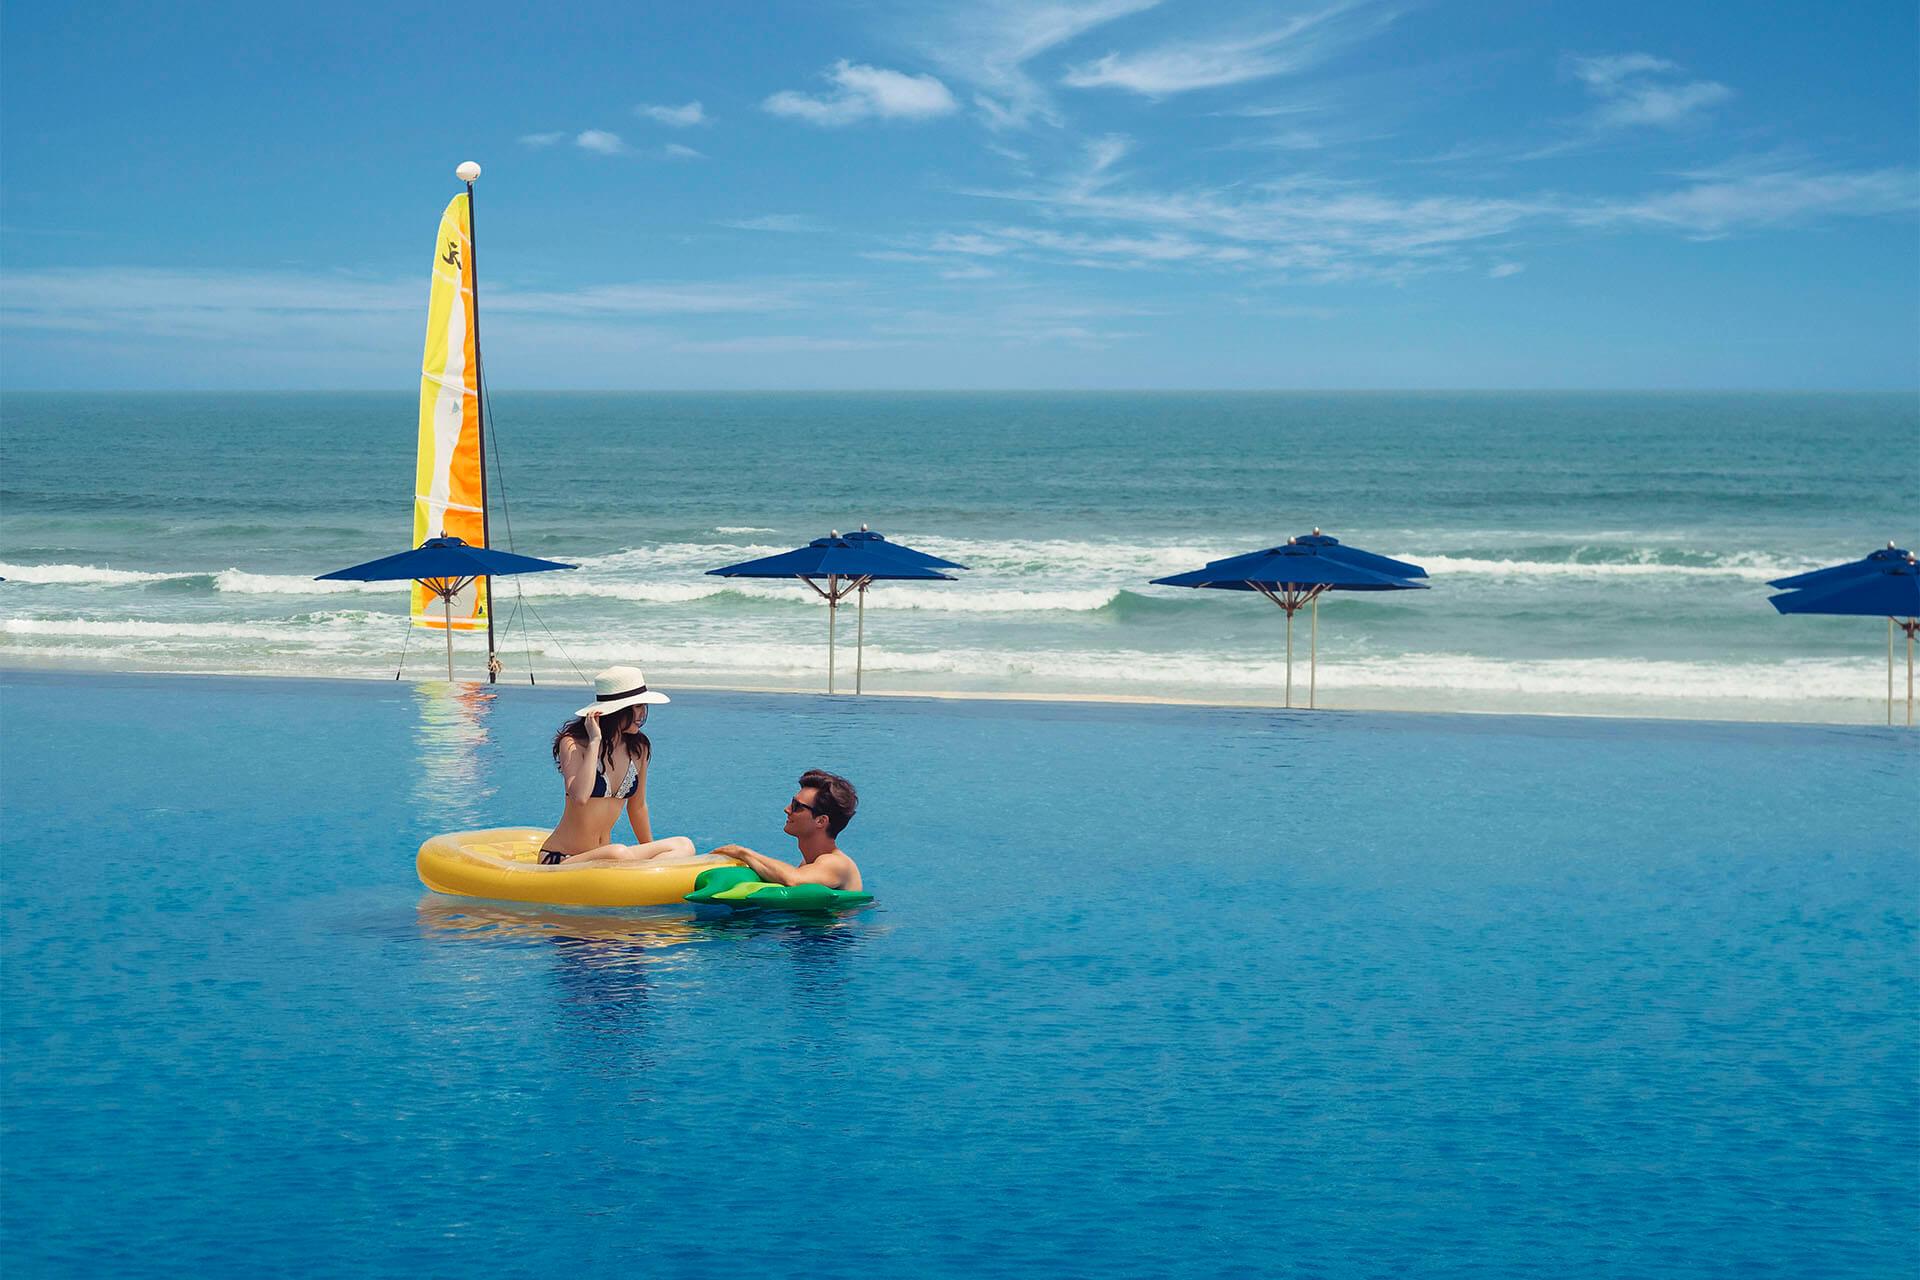 Vui He Thanh Thoi Voi Ki Nghi Duong Trong Ngay Tai Sheraton Grand Danang Resort 04